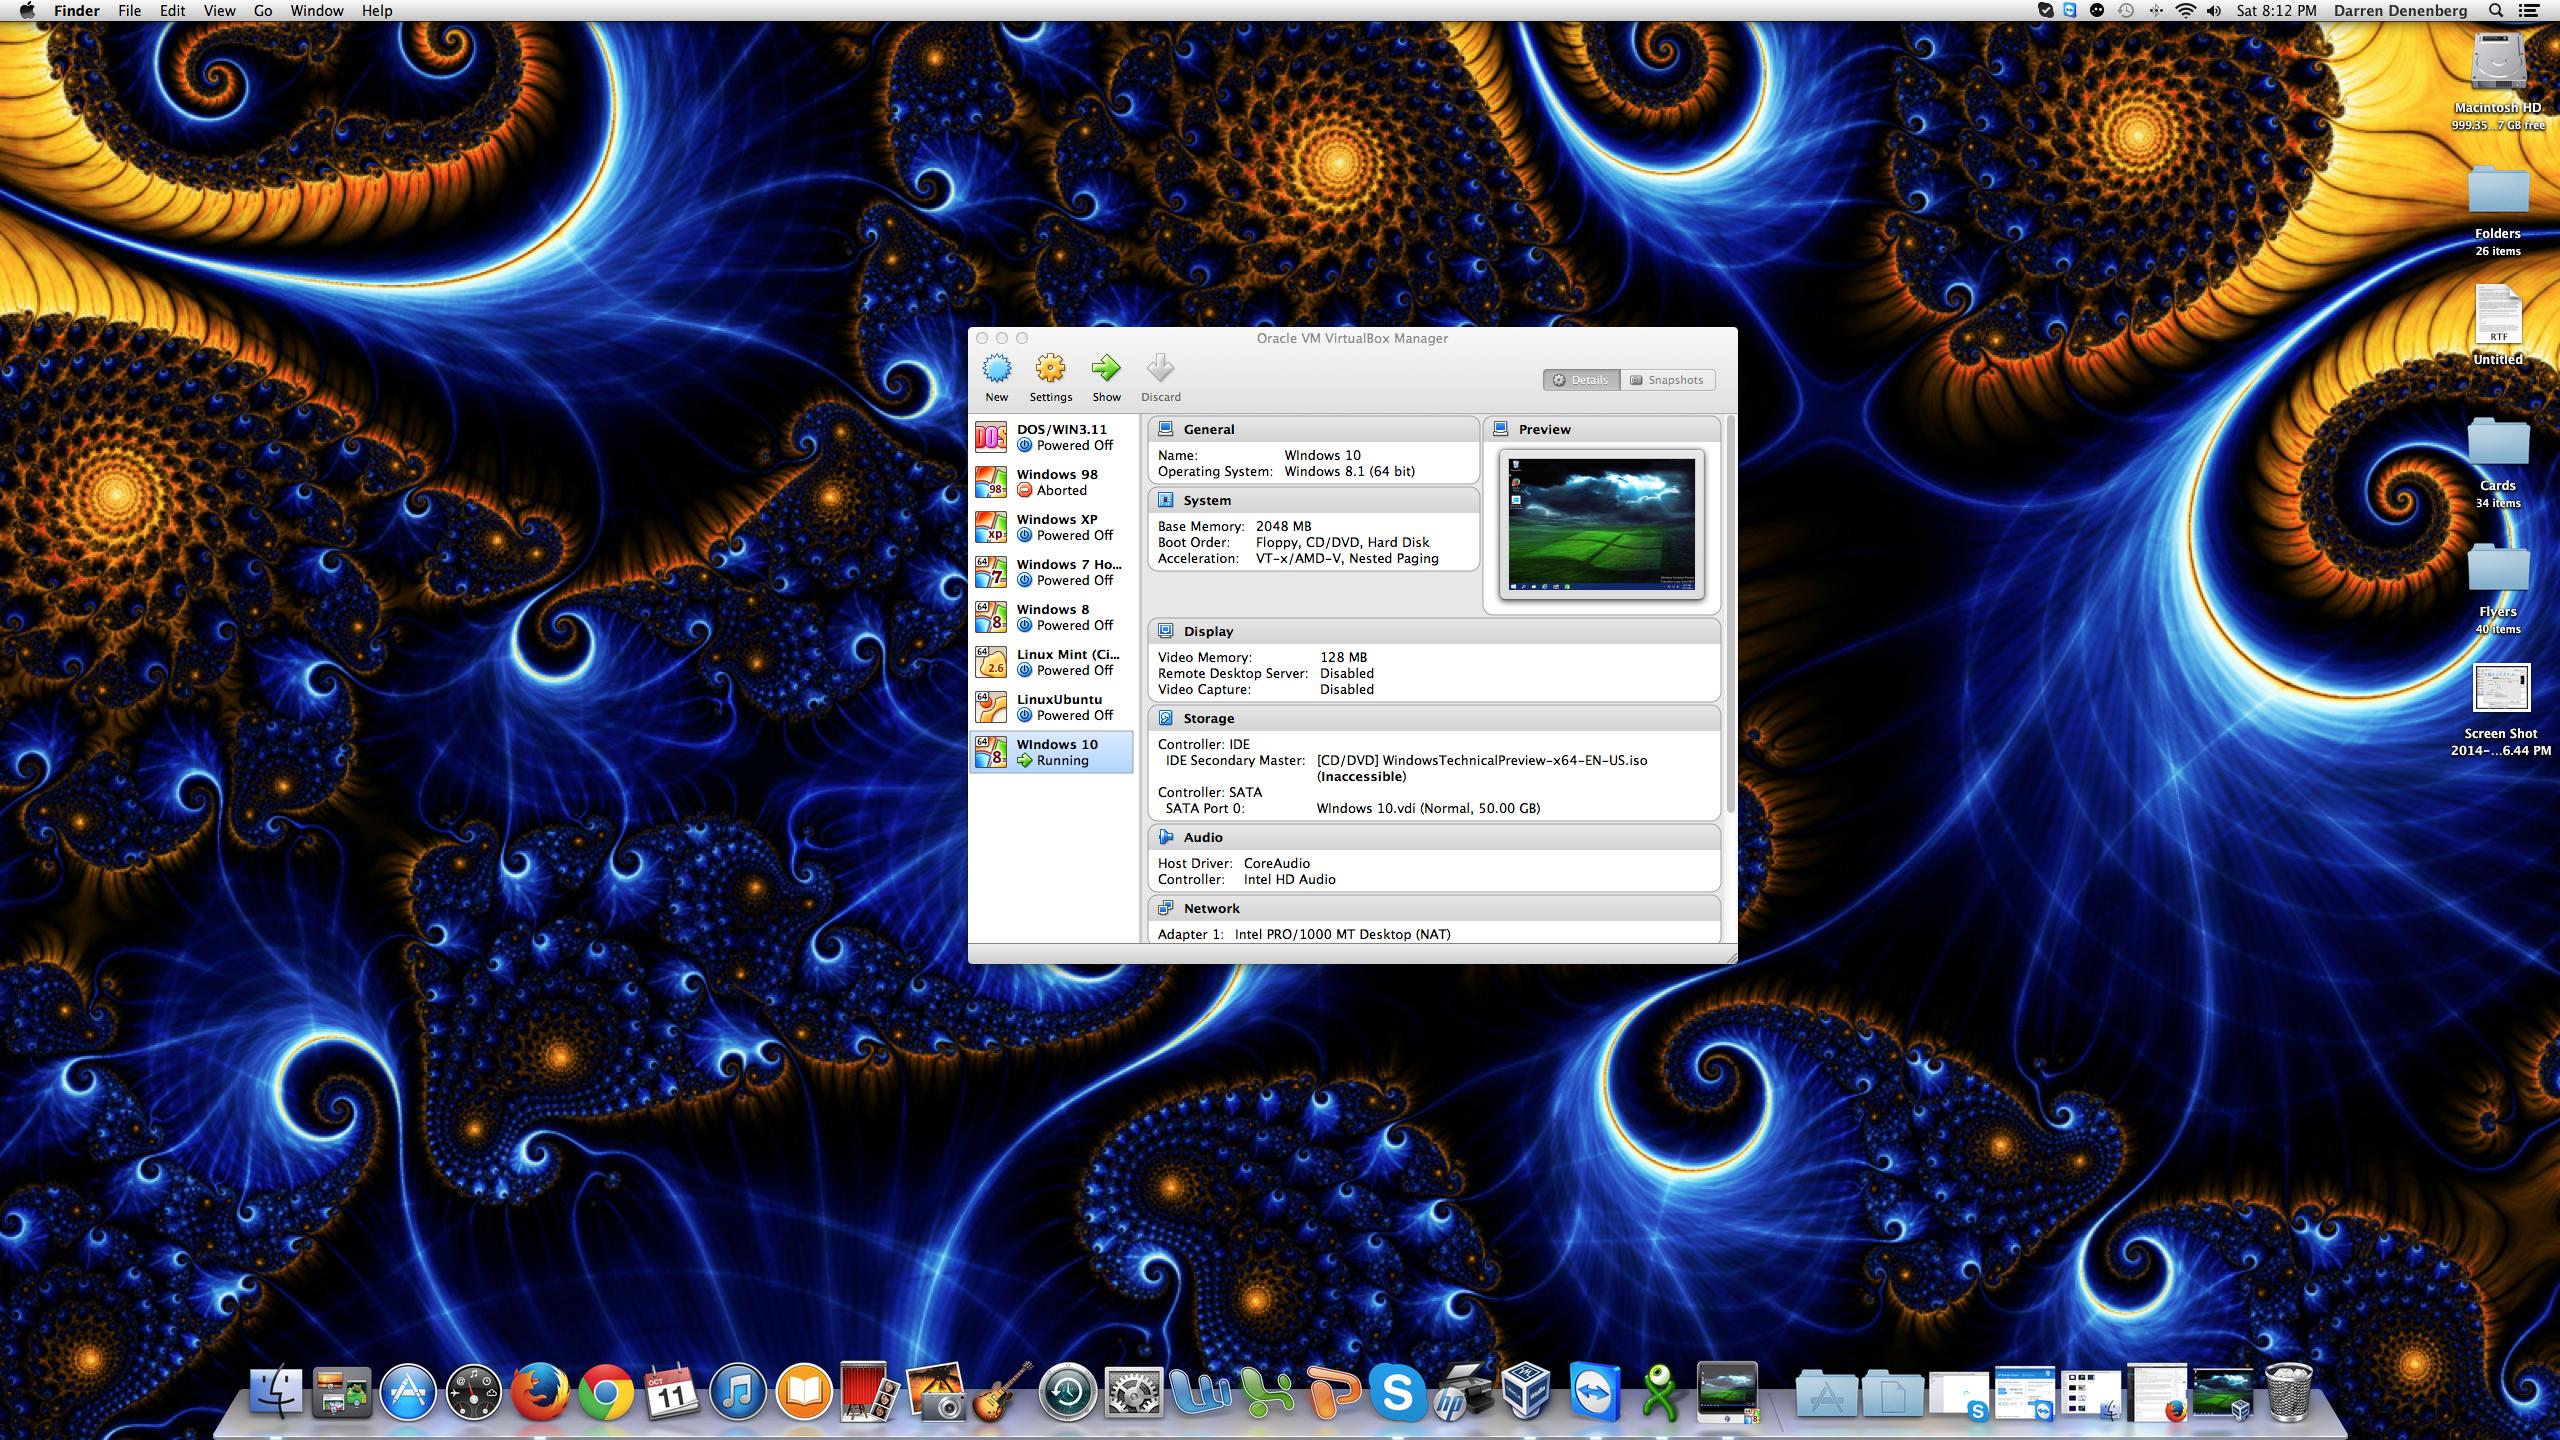 Oracle's VirtualBox running on my Mac